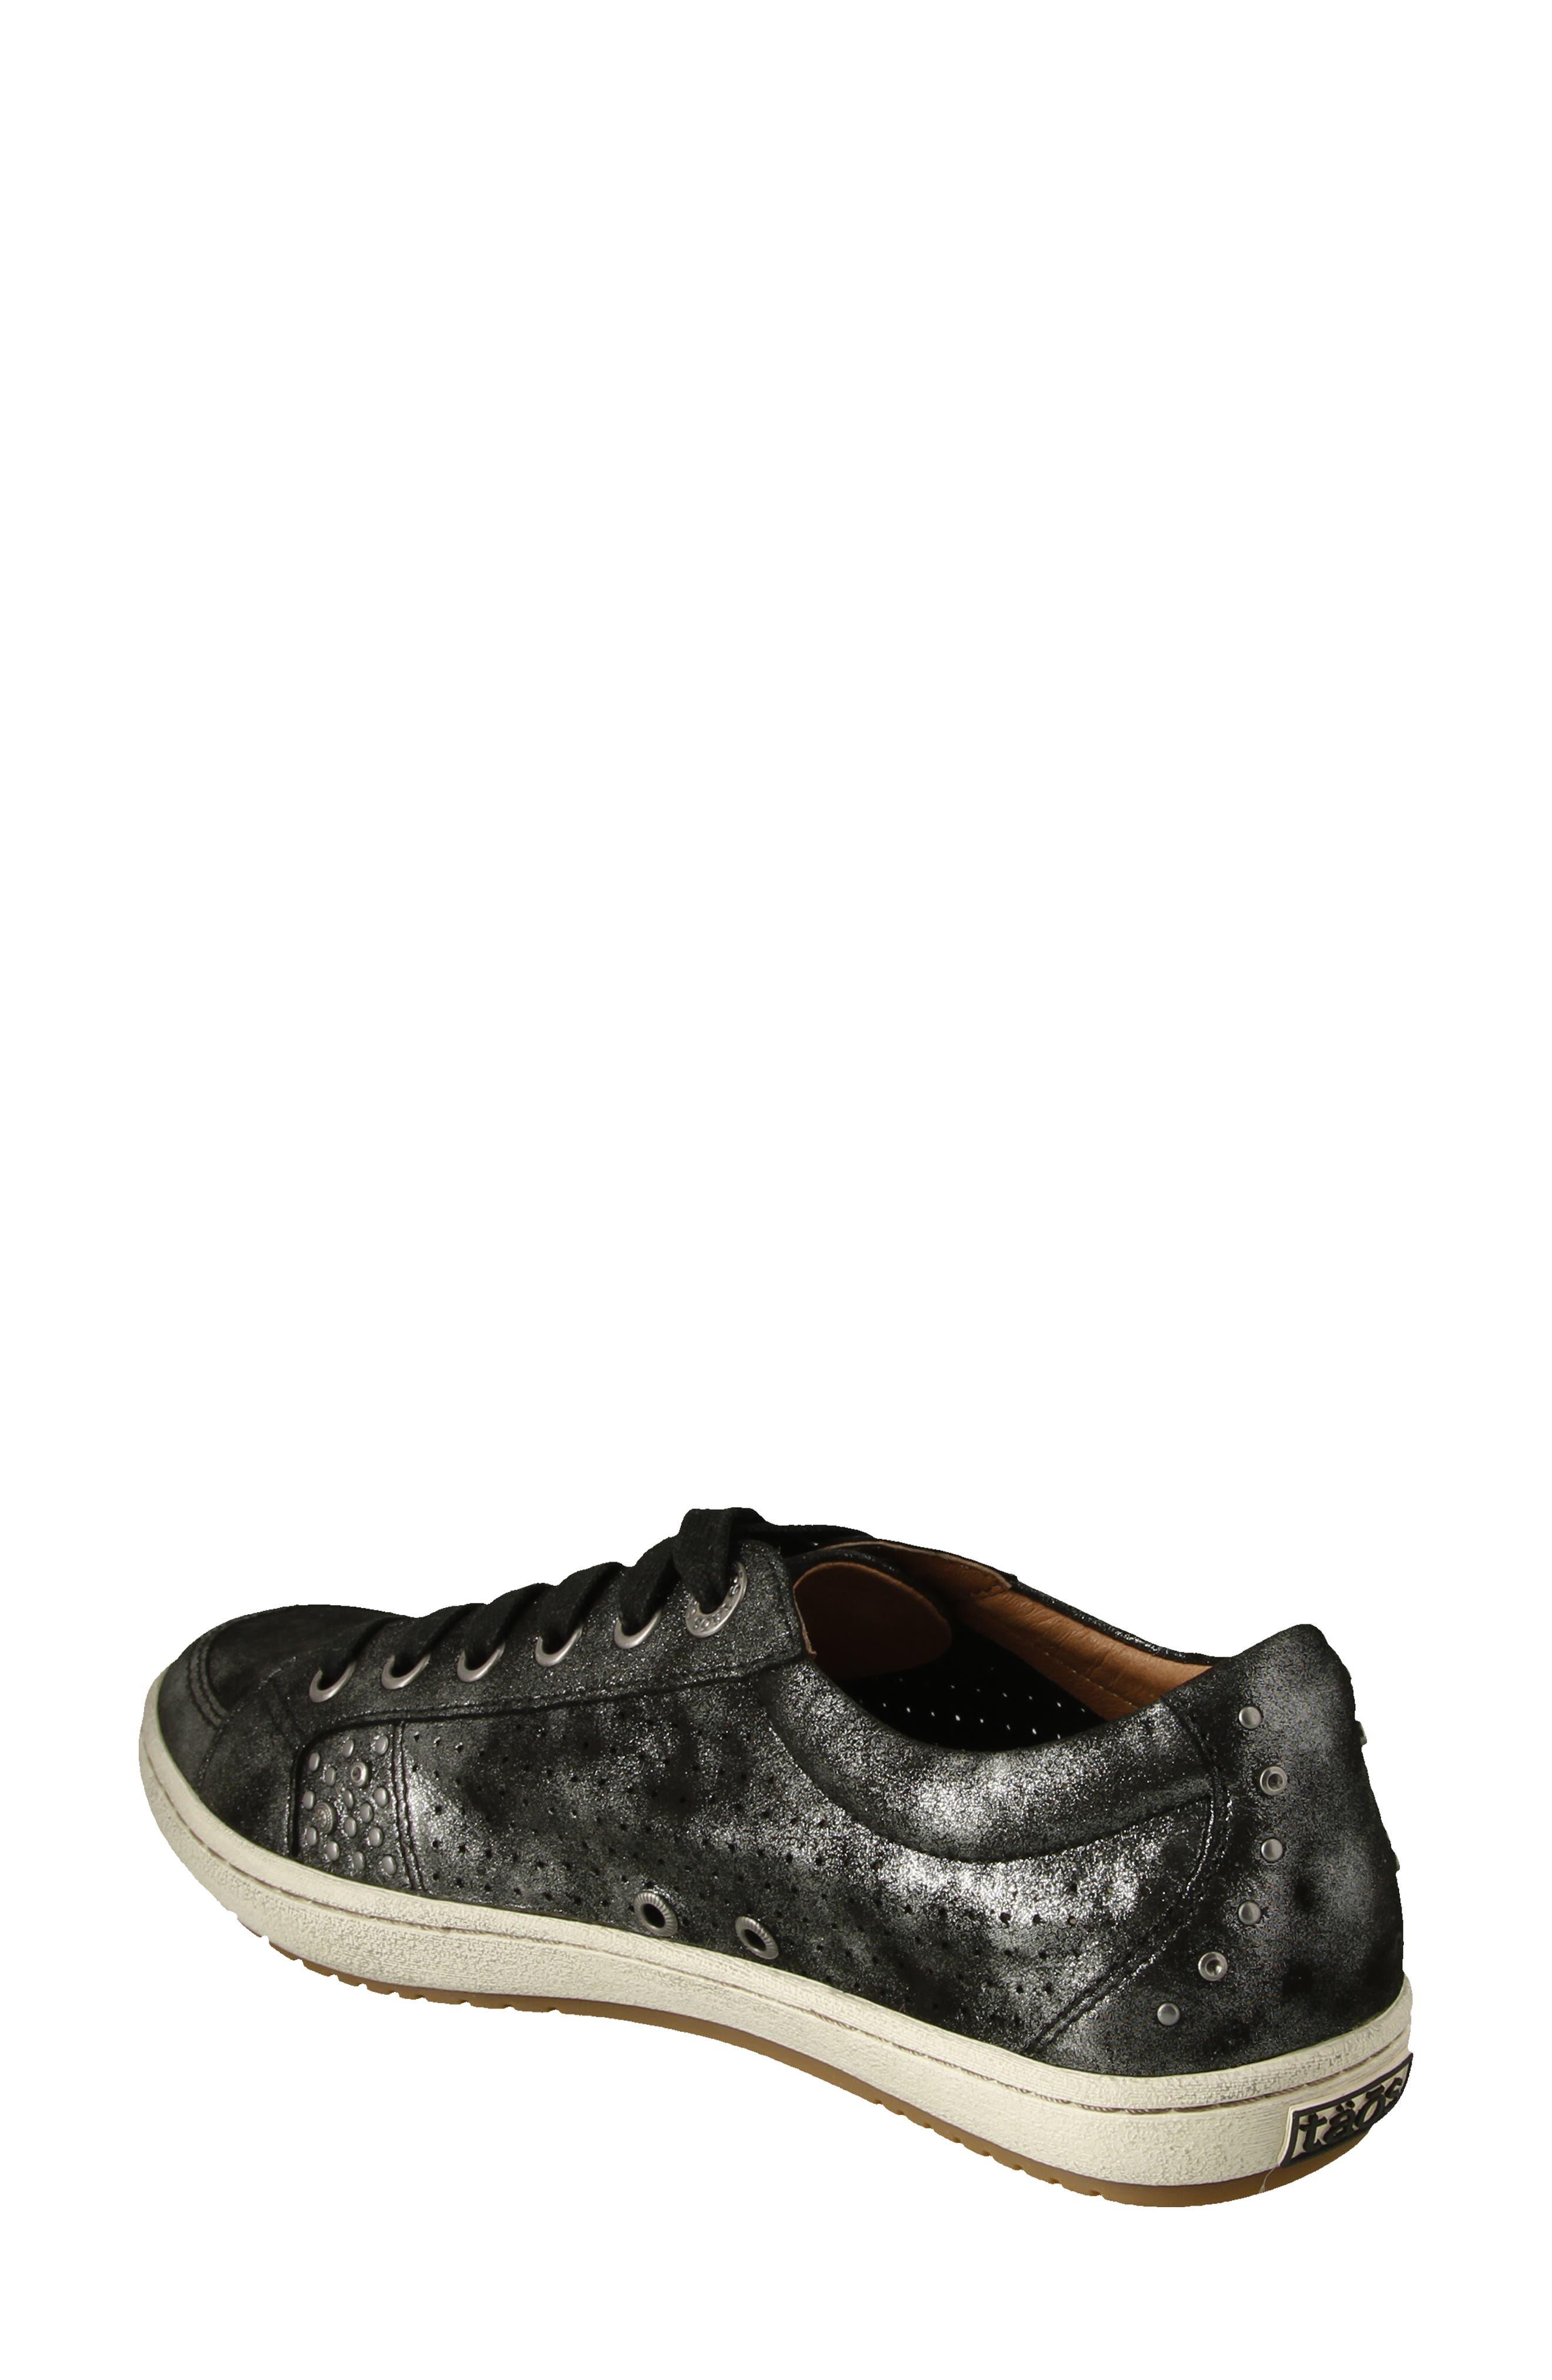 'Freedom' Sneaker,                             Alternate thumbnail 2, color,                             BLACK METALLIC LEATHER